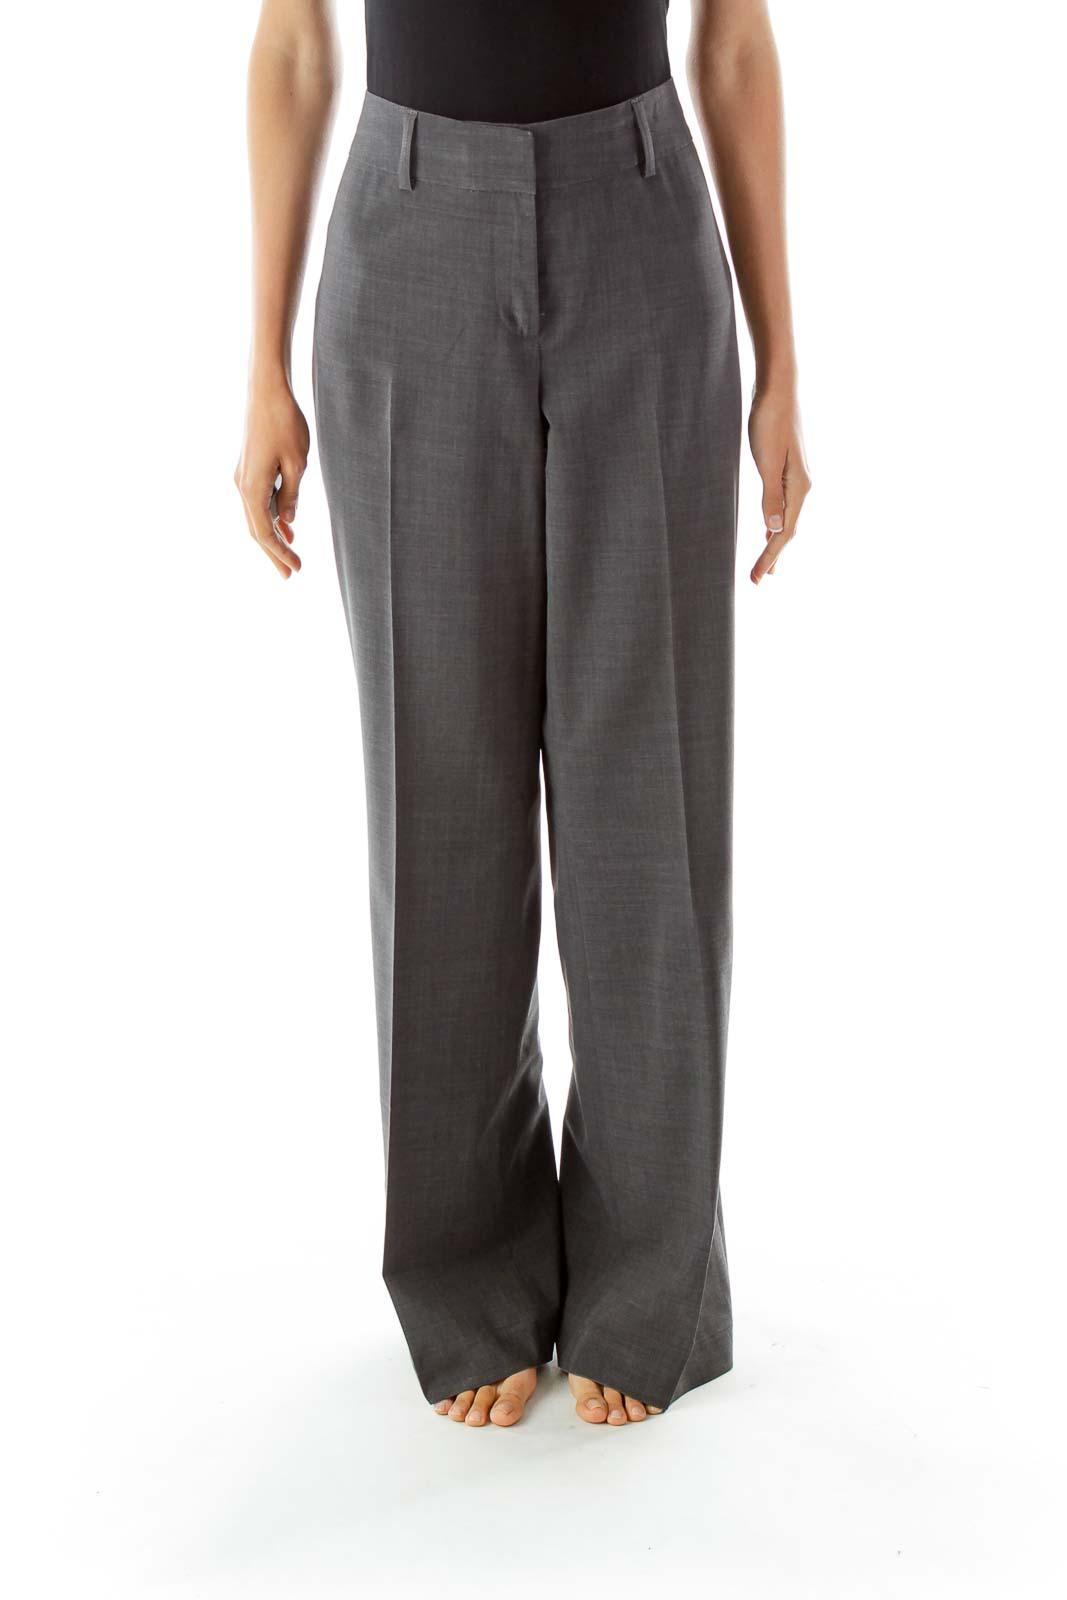 Gray Wide Leg Pants Front